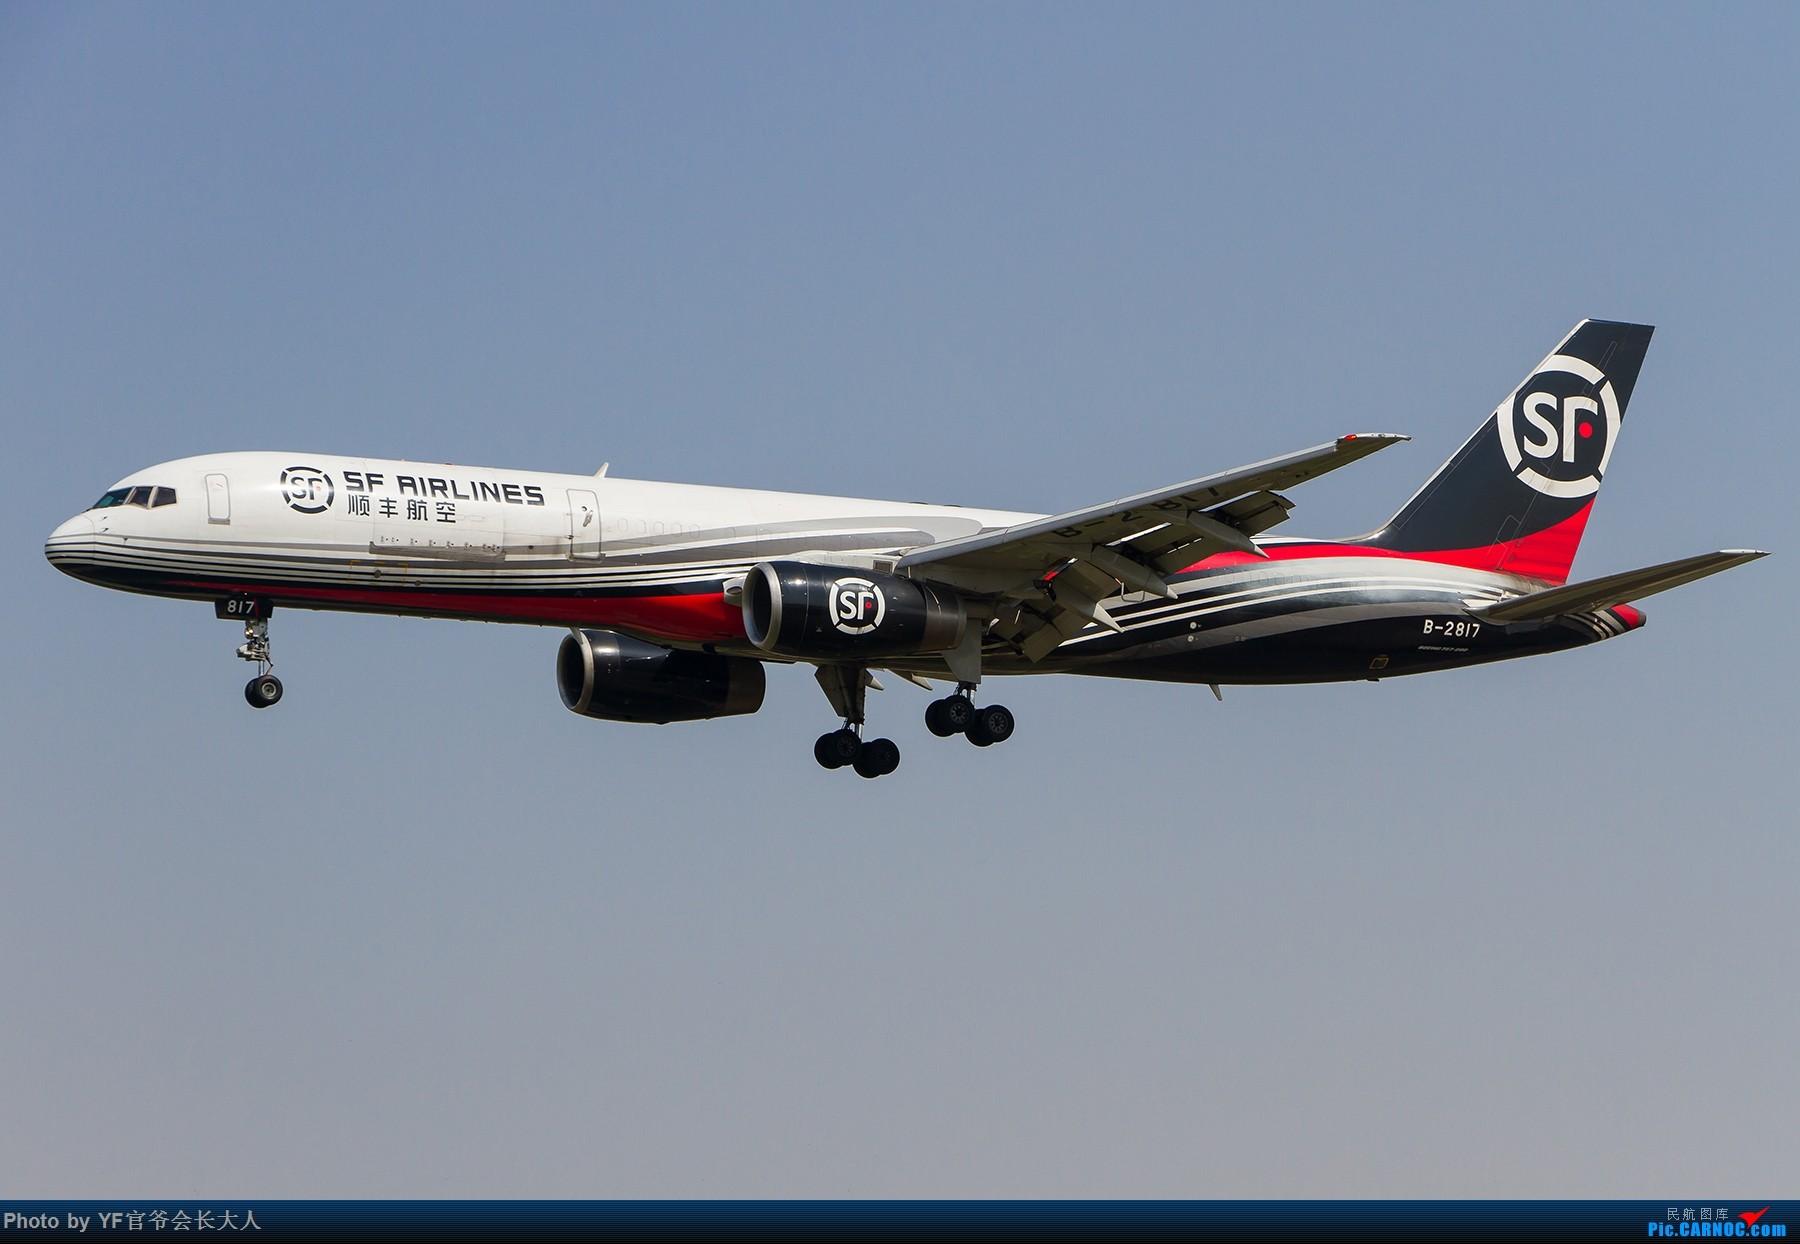 Re:[原创]【ZYTX】轻易不拍机,拍就要拍个过瘾!(新开的酷鸟,亚洲大西洋,顺带碰上朝韩两国的好货) BOEING 757-200 B-2817 中国沈阳桃仙国际机场